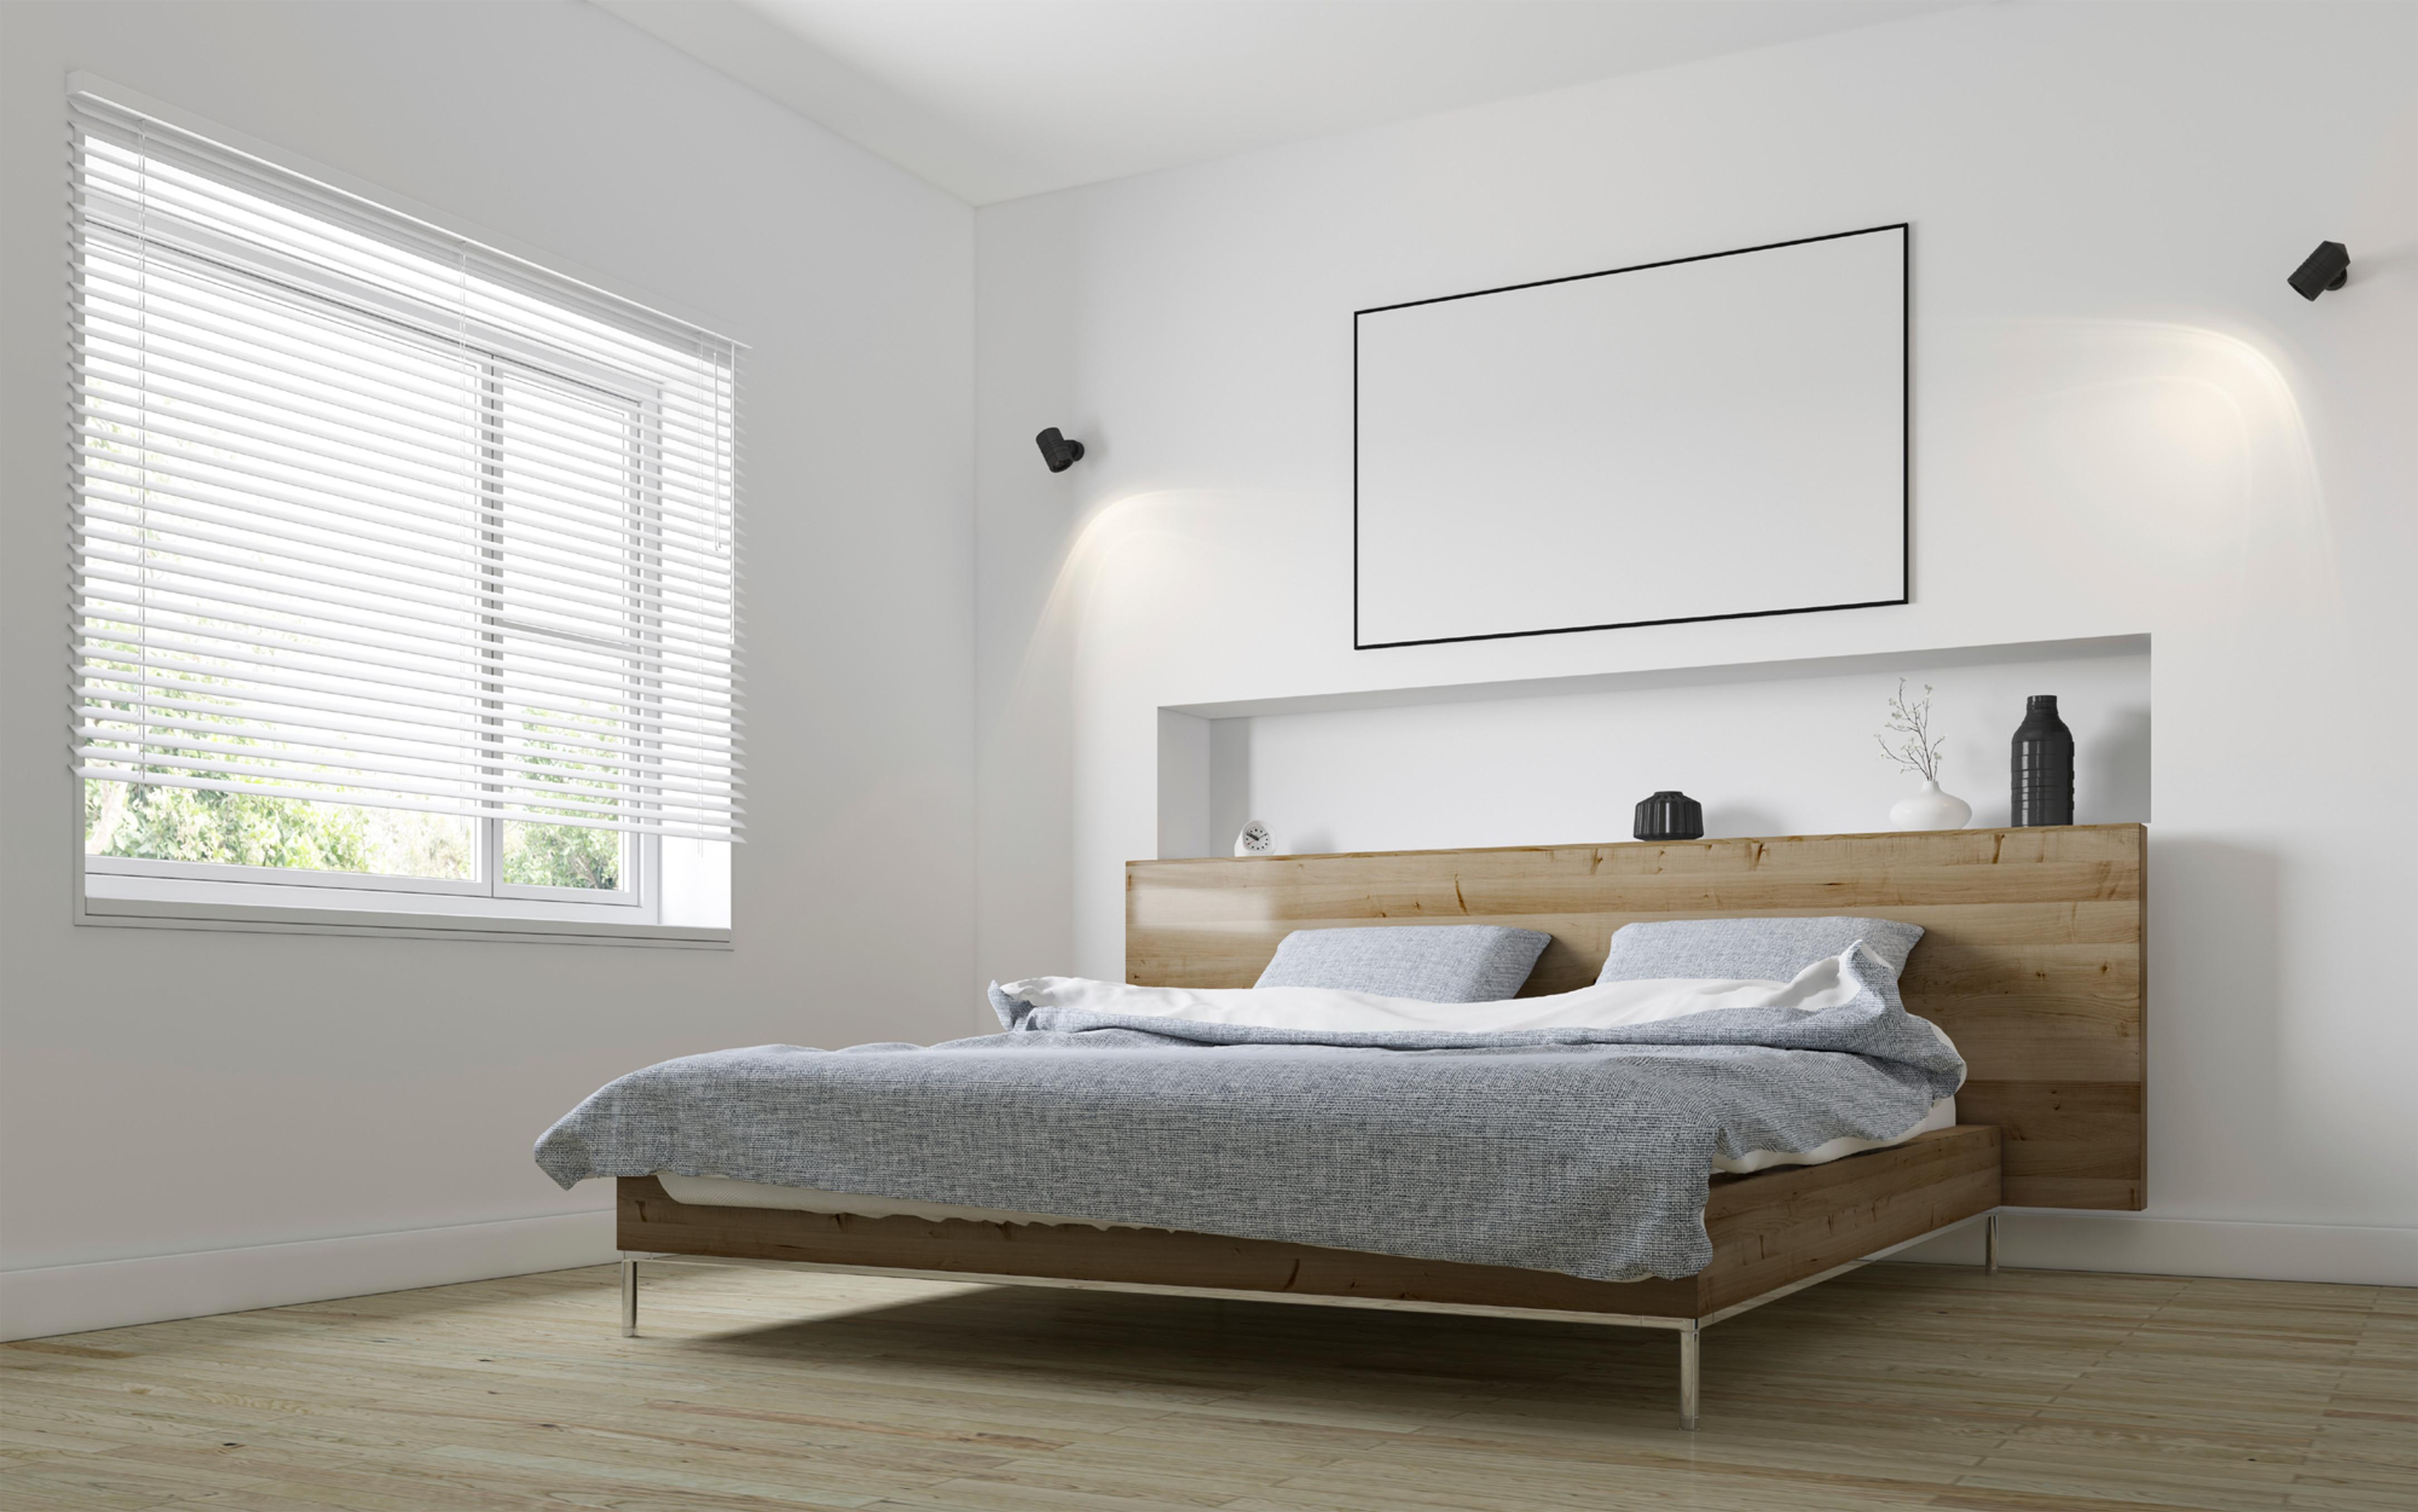 Standard Listing + Zillow 3D Home Tour